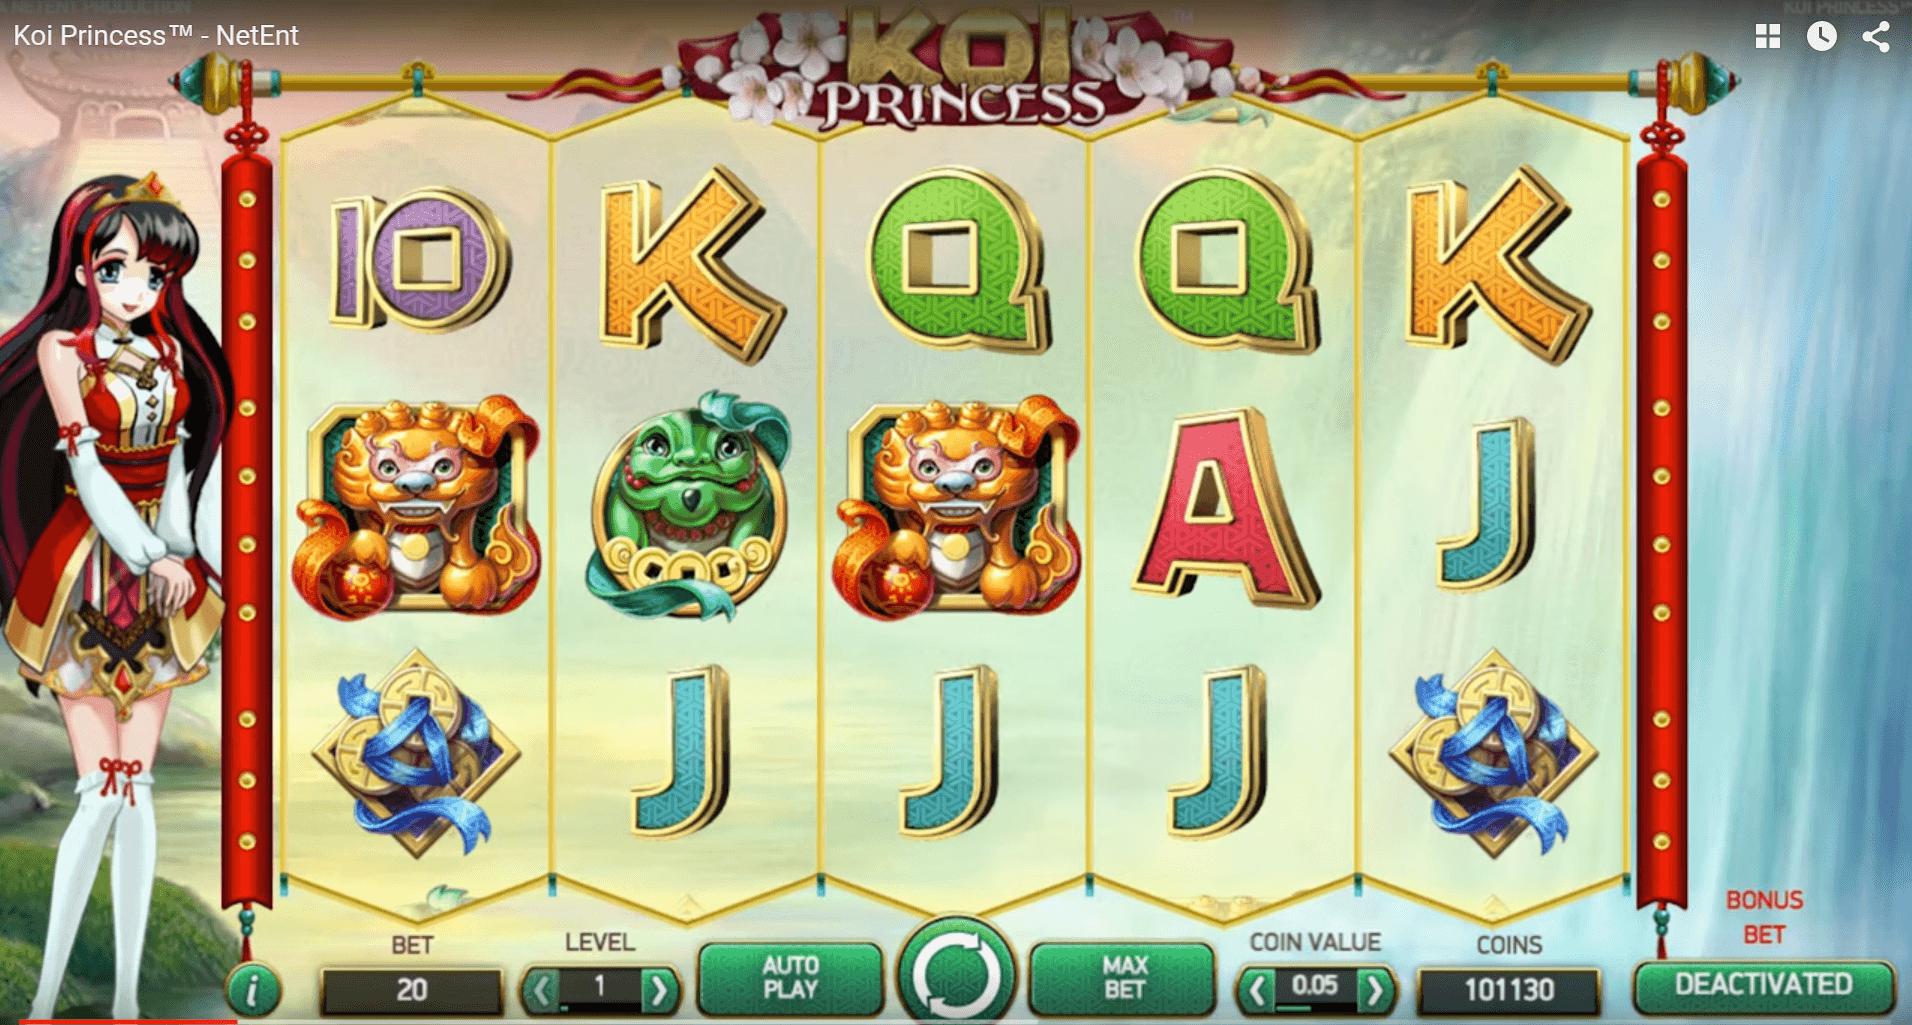 Hoe Speel je Koi Princess NetEnt Gokkast